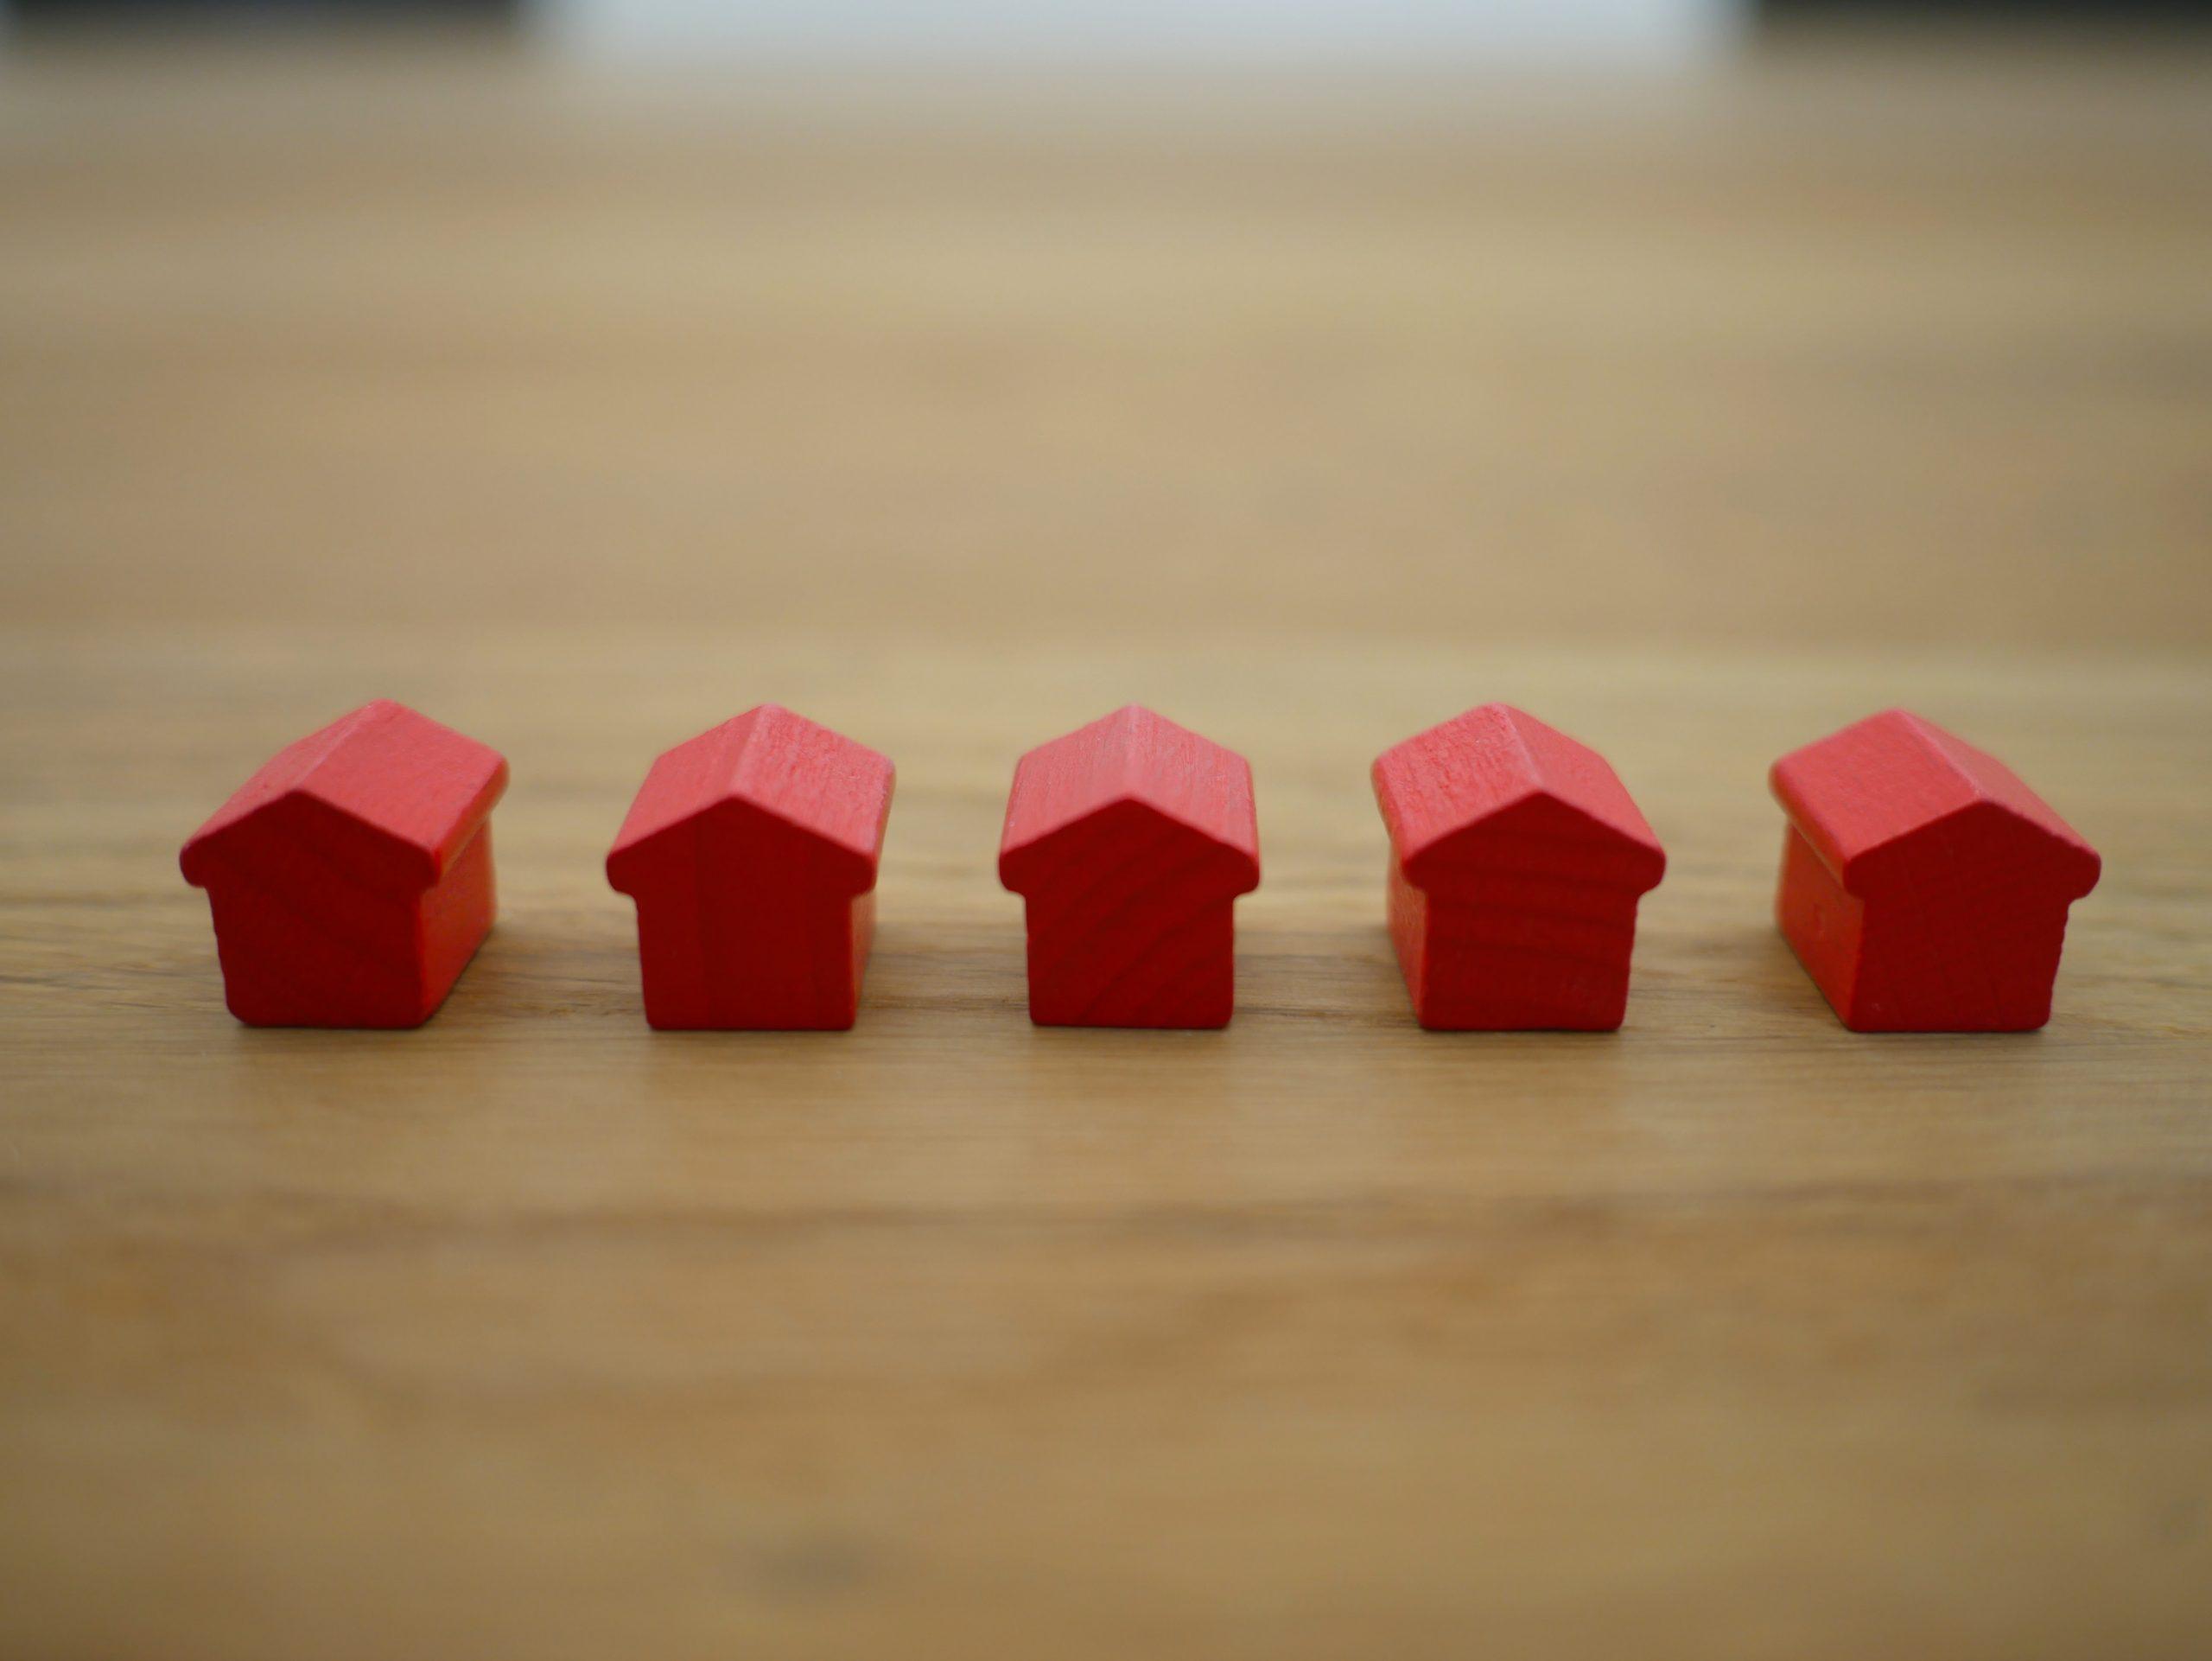 Georgia soon to debut $354 million emergency mortgage assistance program